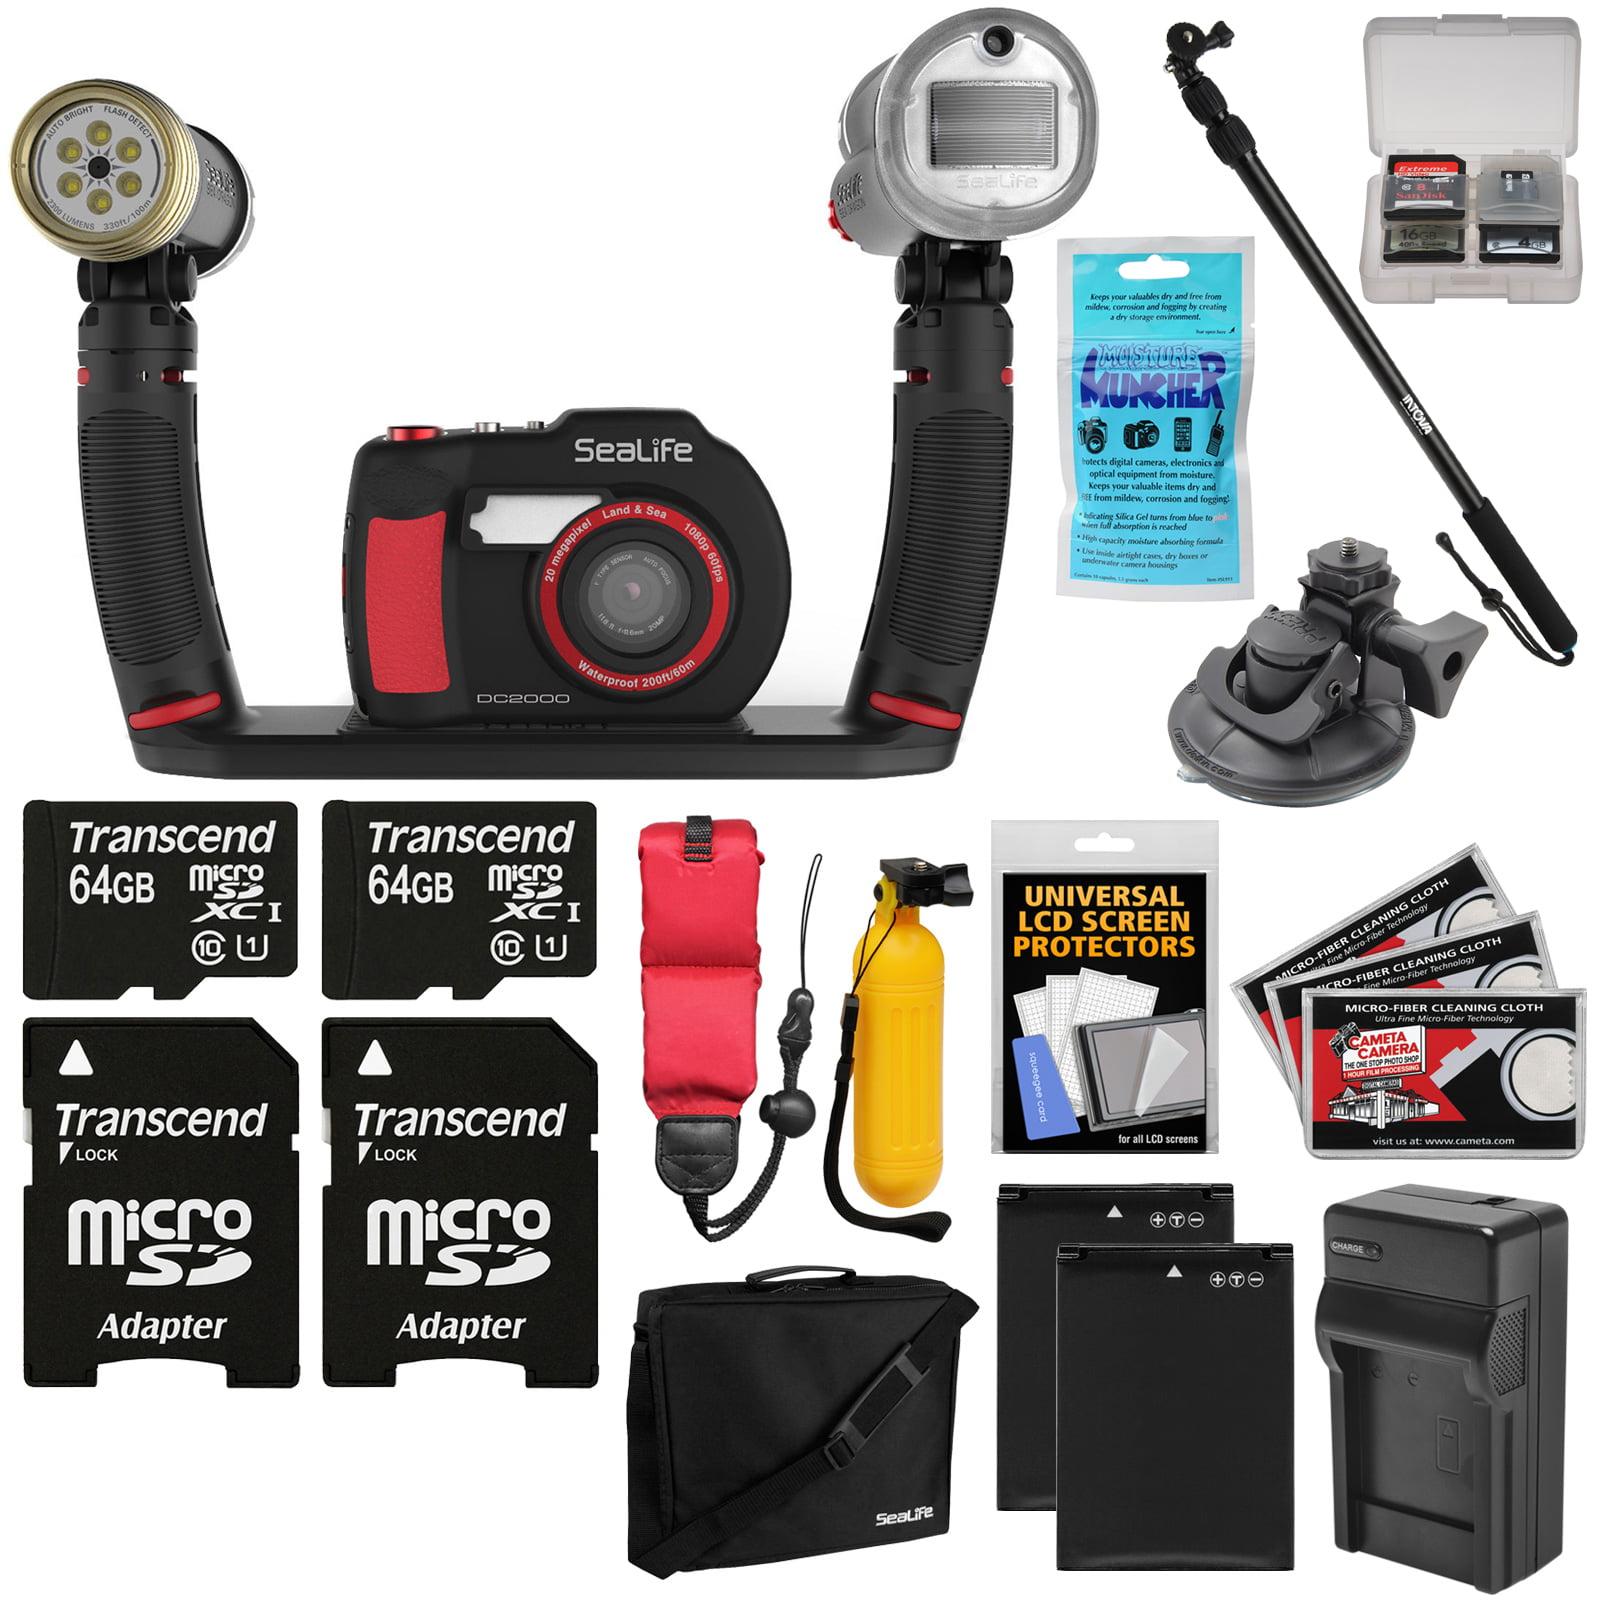 SeaLife DC2000 HD Underwater Digital Camera with Sea Dragon Pro Duo Light & Flash Set + 2 64GB Cards +... by SeaLife